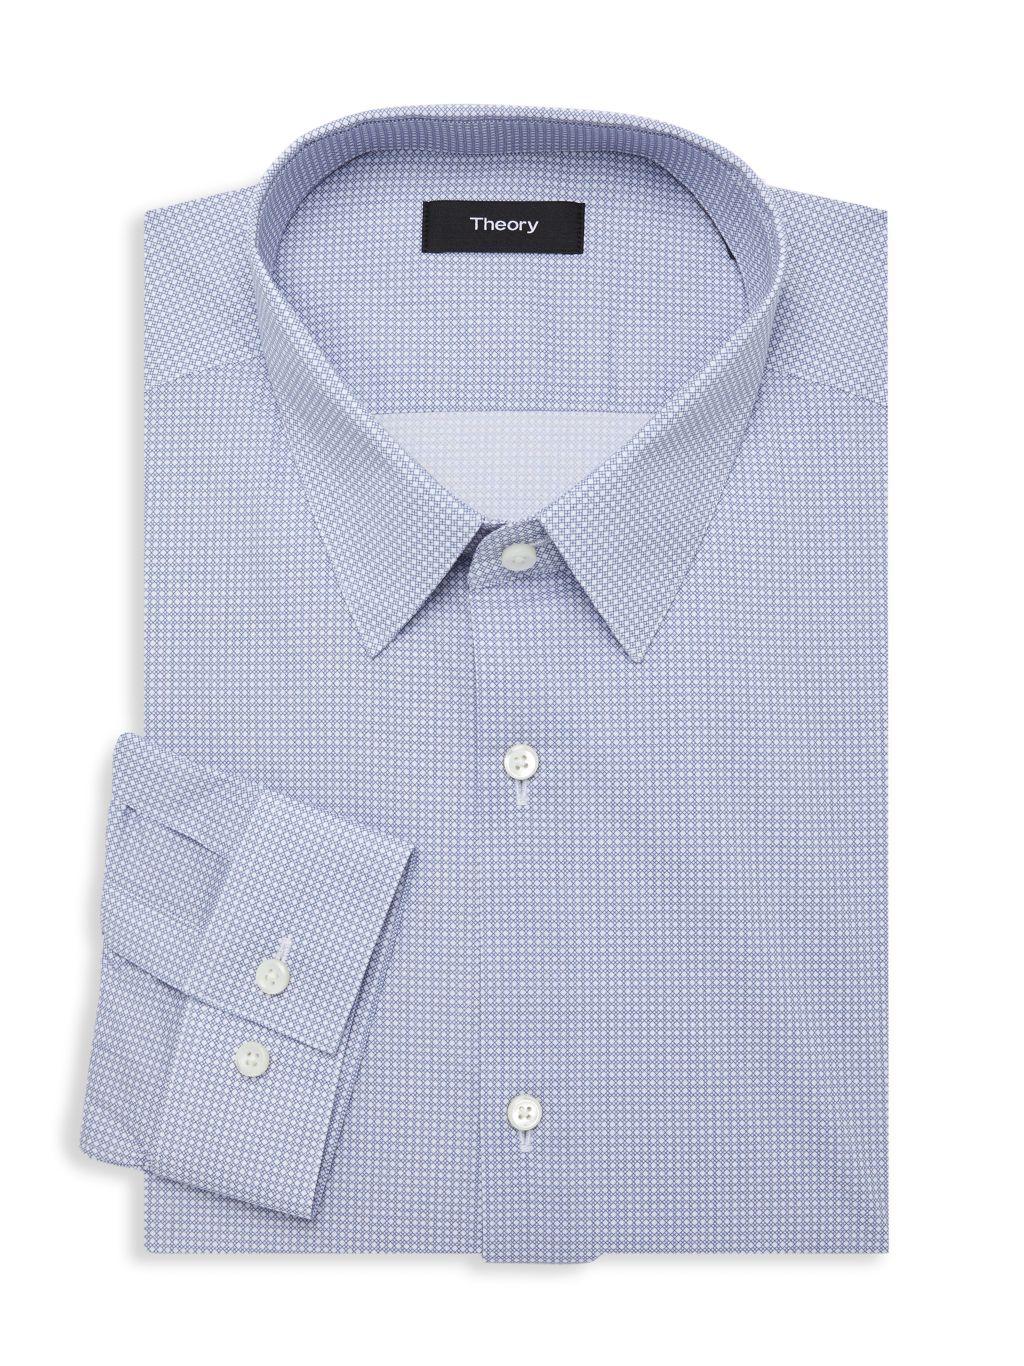 Theory Cedrick-Printed Dress Shirt